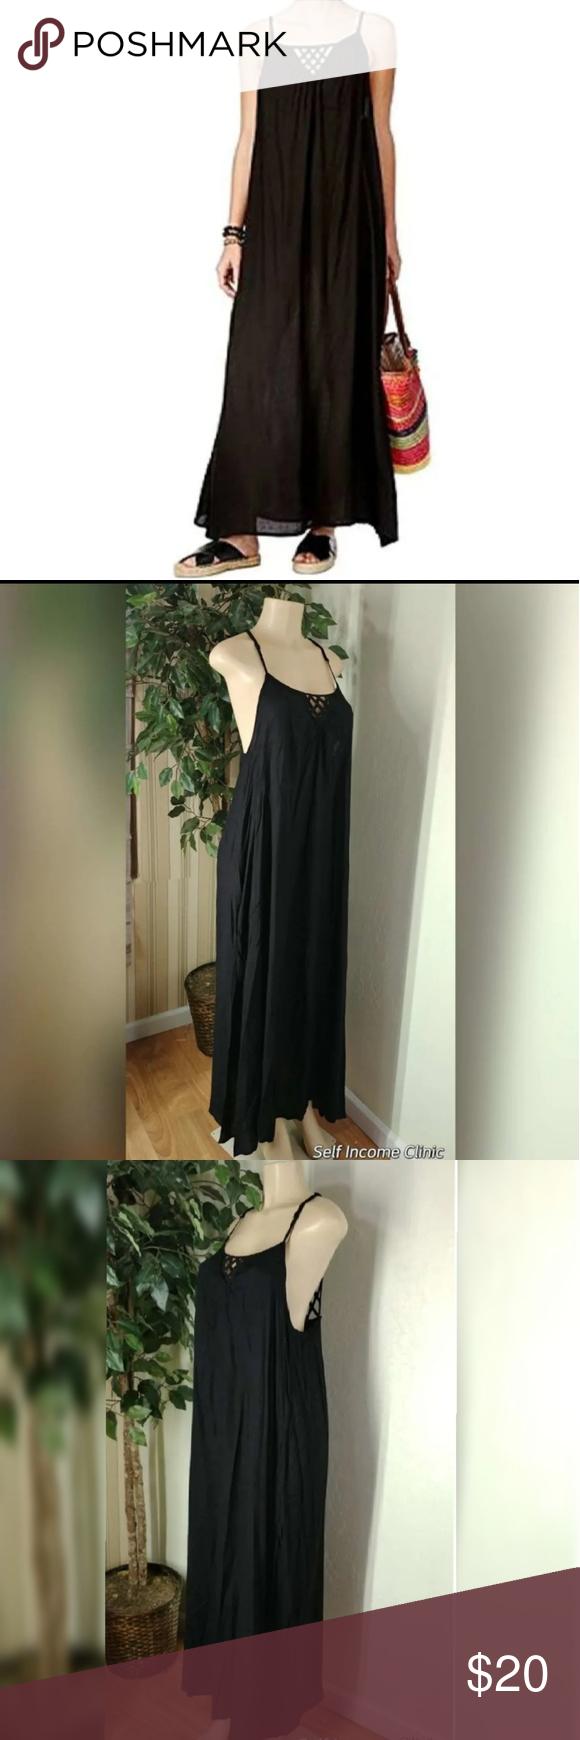 6e8d6925f0 Raviya Women's Lattice-back Maxi-Dress